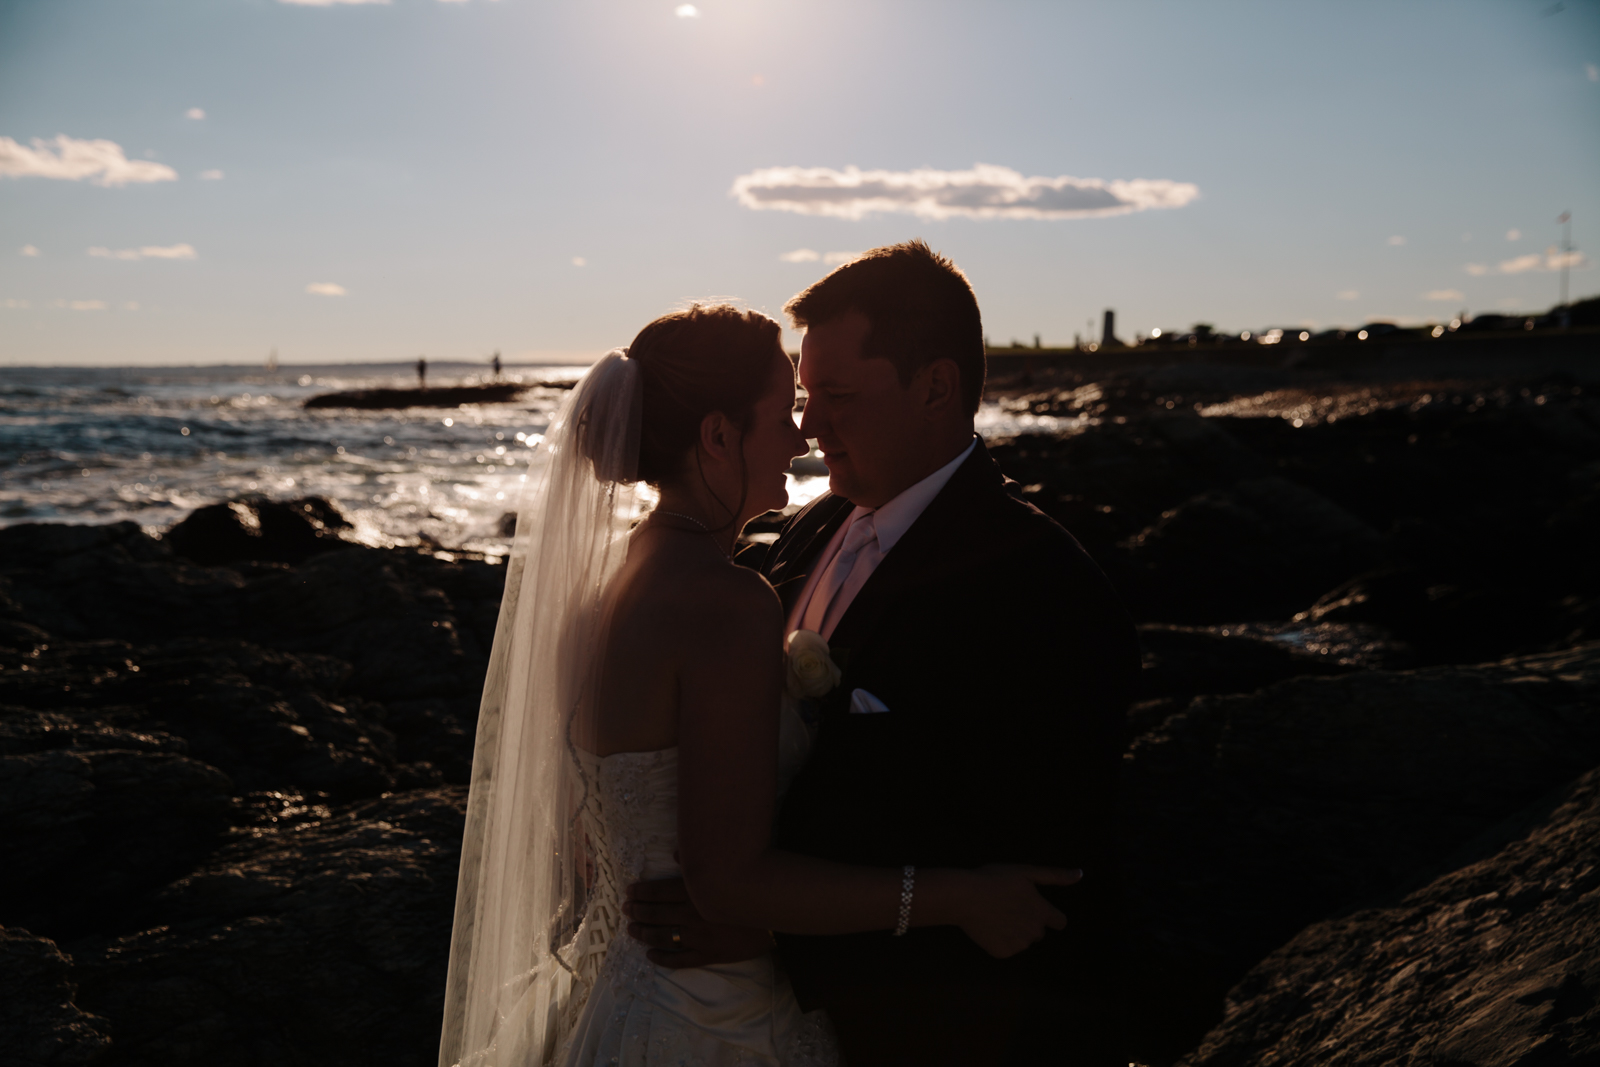 Eastons-Beach-Rotunda-Ballroom-Wedding-Newport-Rhode-Island-PhotographybyAmandaMorgan-71.jpg